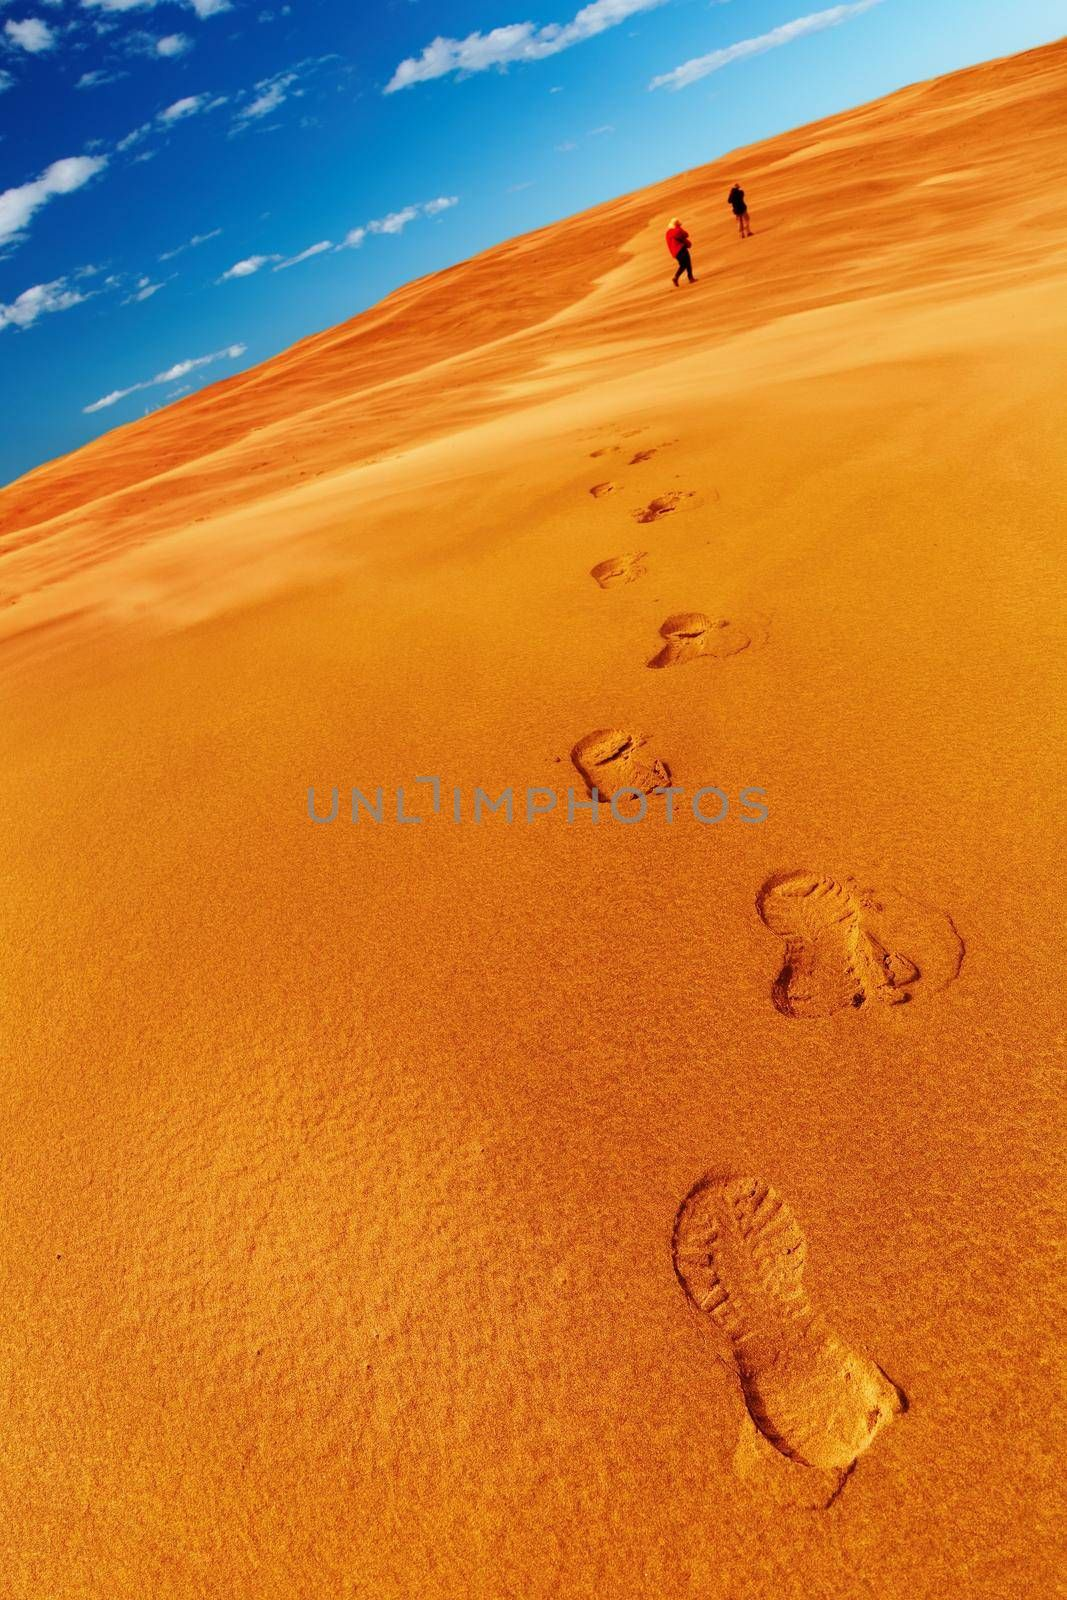 People in desert, sand dune climbing